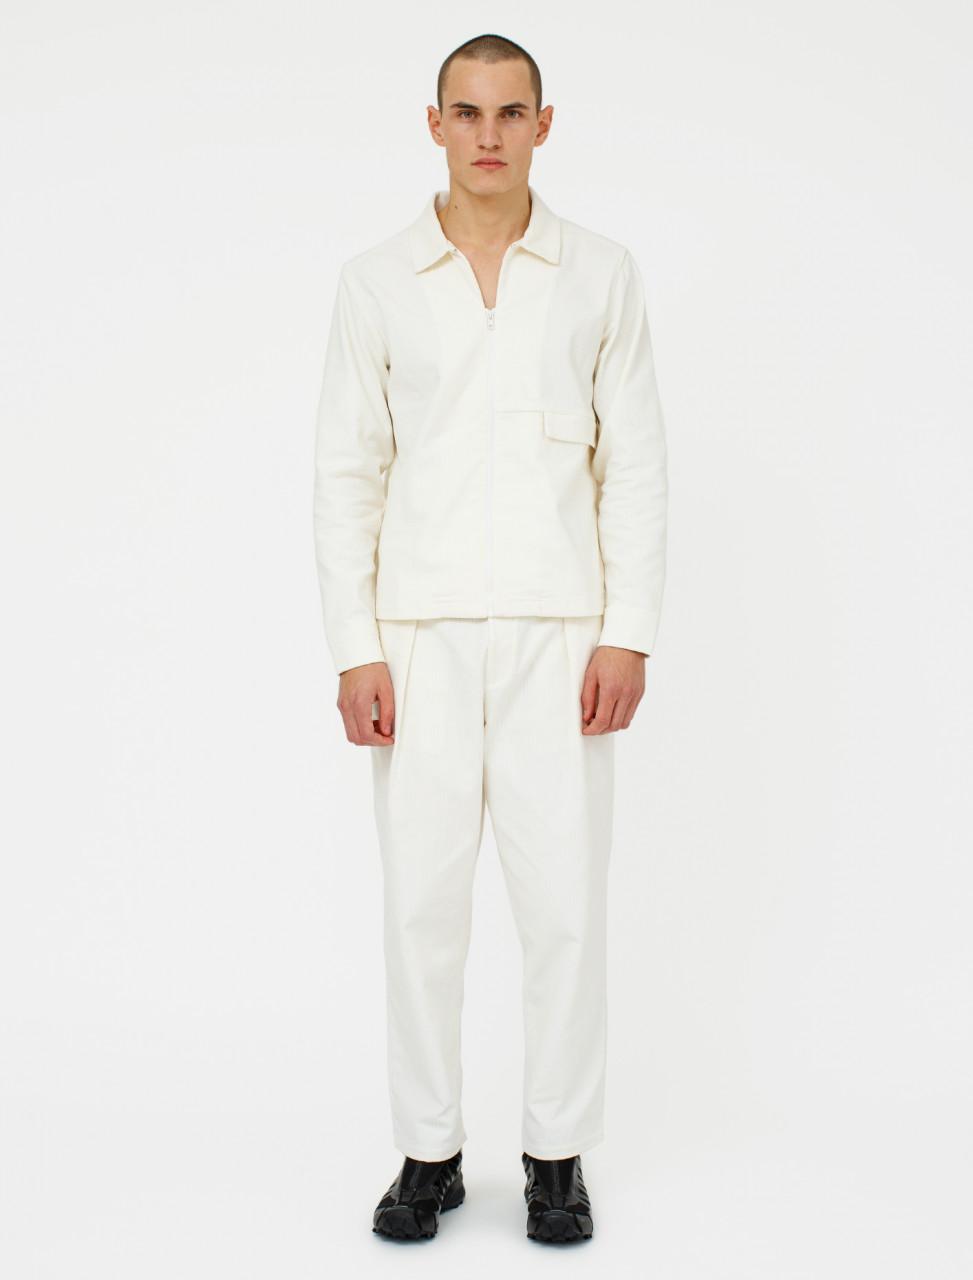 A-C01 Trouser